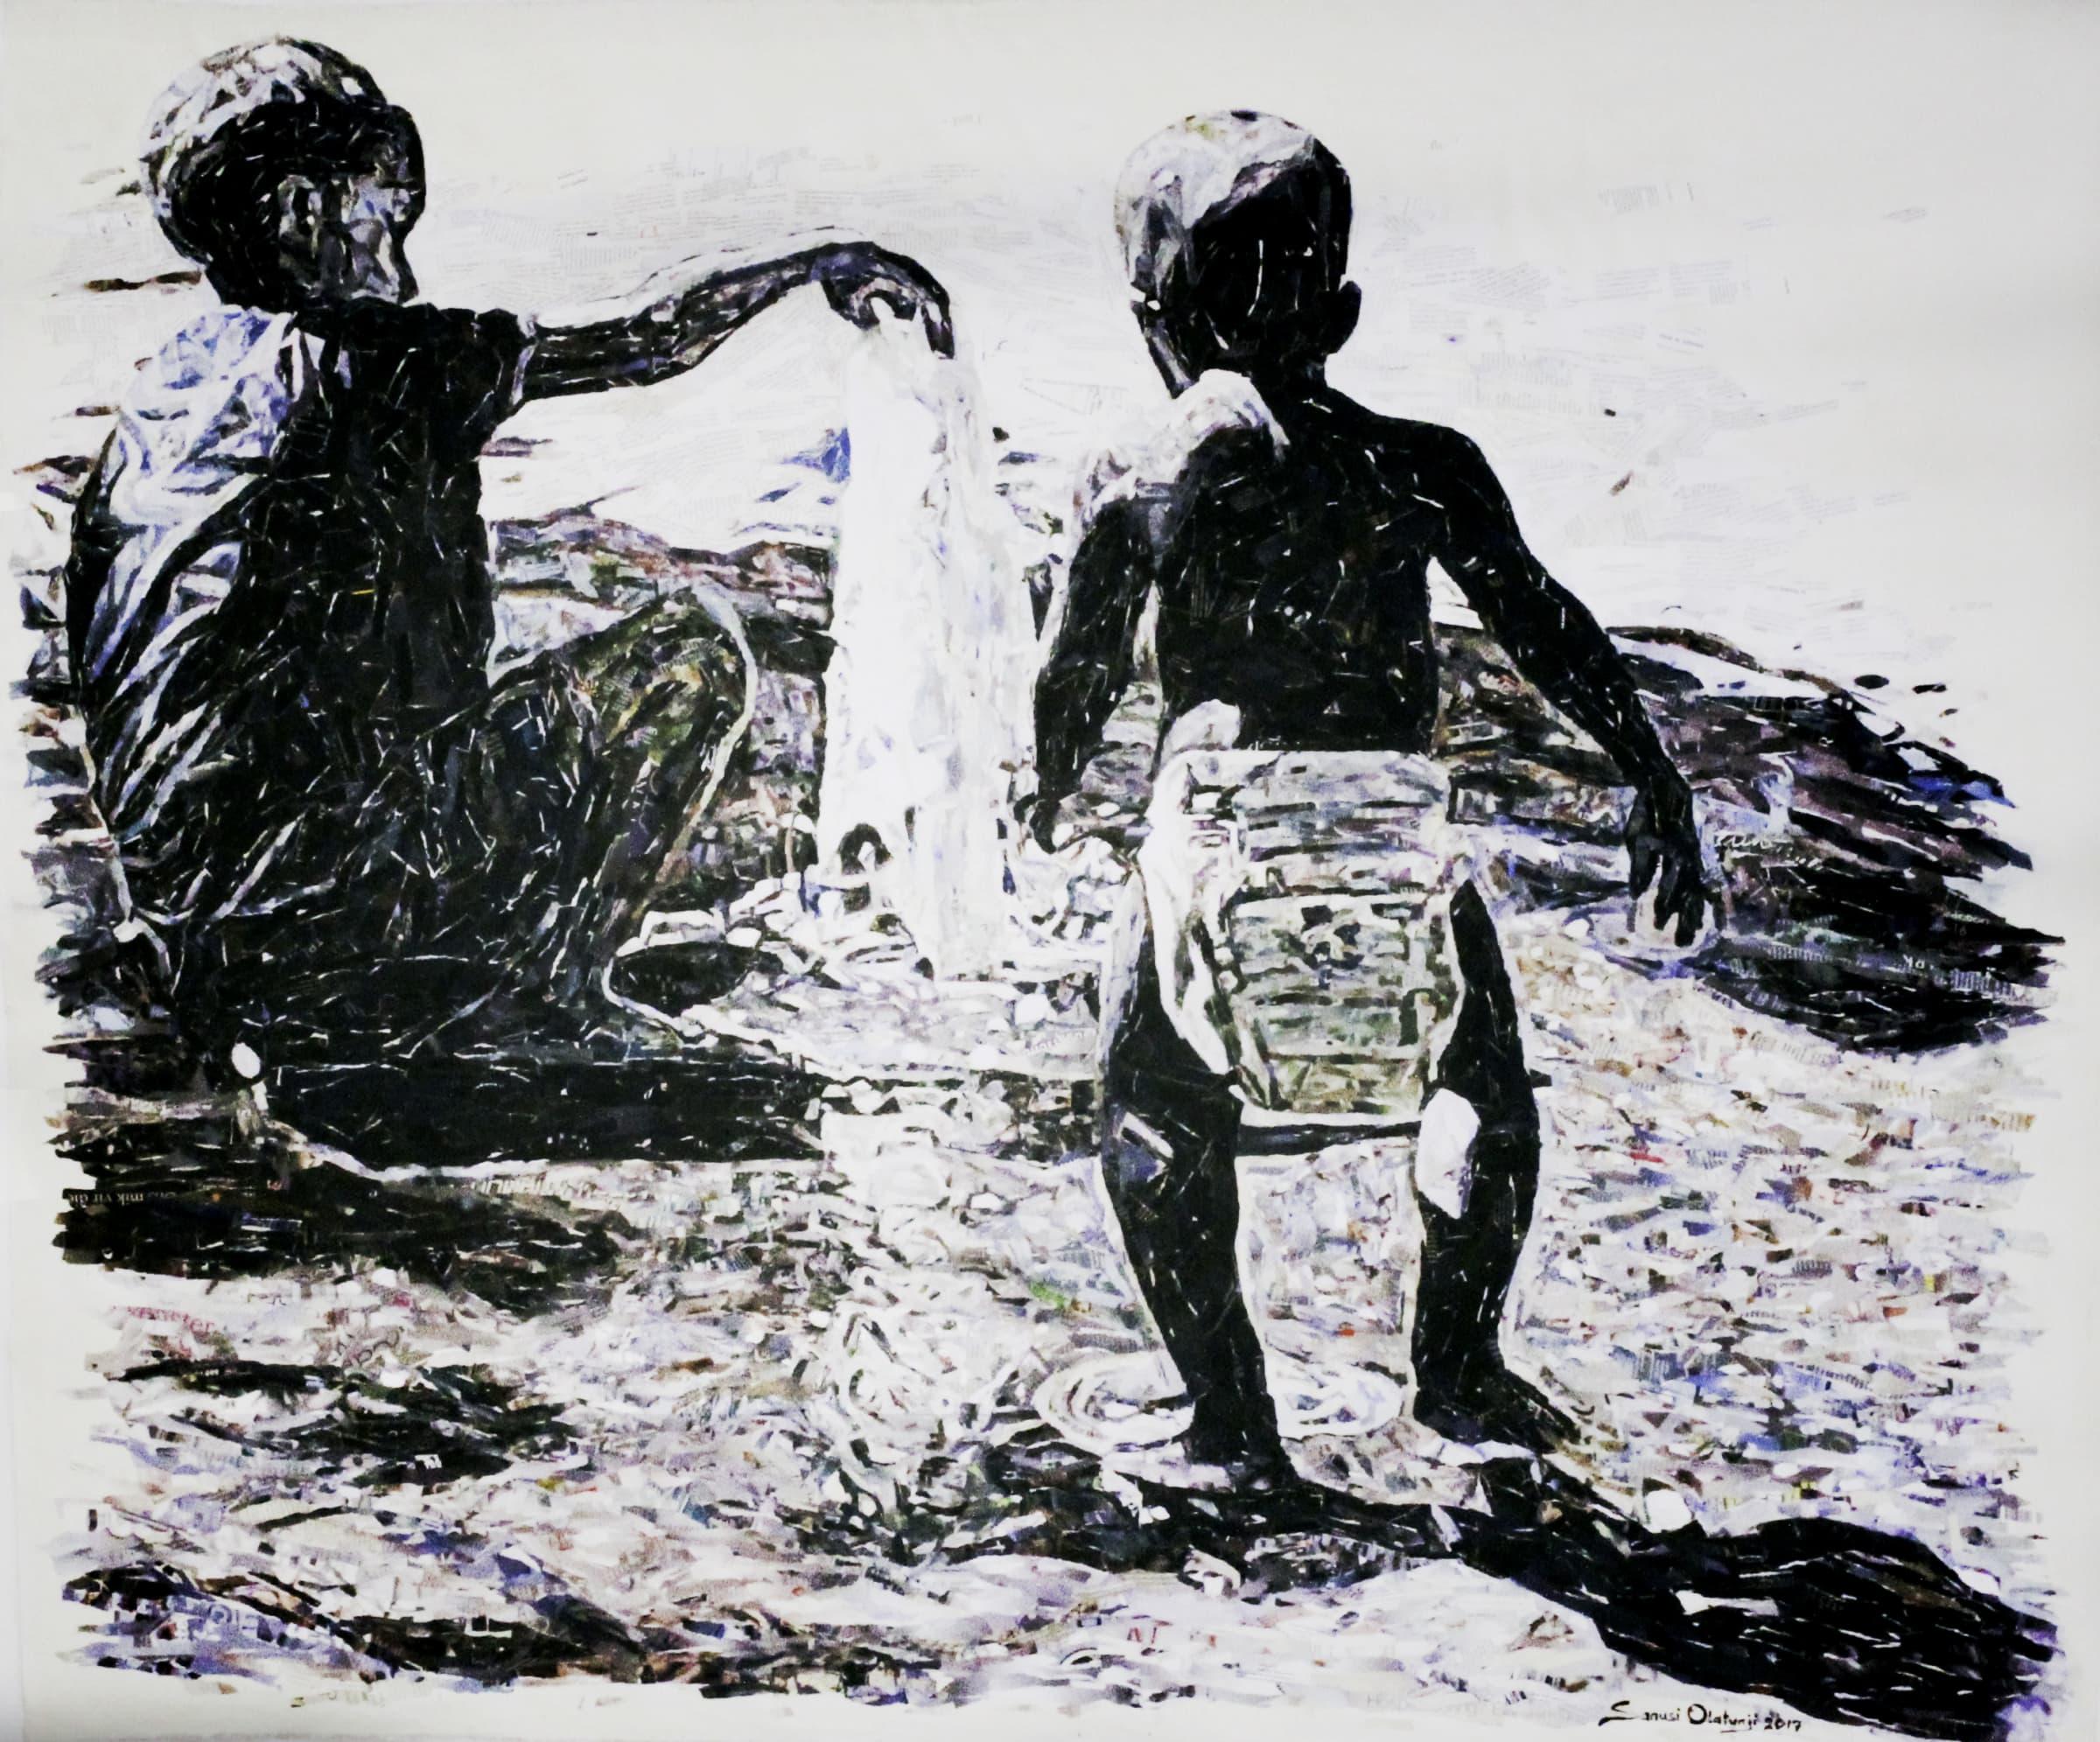 <span class=&#34;link fancybox-details-link&#34;><a href=&#34;/artists/36-olatunji-sanusi/works/1351-olatunji-sanusi-fountain-ii-2017/&#34;>View Detail Page</a></span><div class=&#34;artist&#34;><strong>Olatunji Sanusi</strong></div> <div class=&#34;title&#34;><em>Fountain II</em>, 2017</div> <div class=&#34;medium&#34;>Paper Collage On Canvas </div> <div class=&#34;dimensions&#34;>163cm x 138cm</div><div class=&#34;price&#34;>R65,000.00</div>